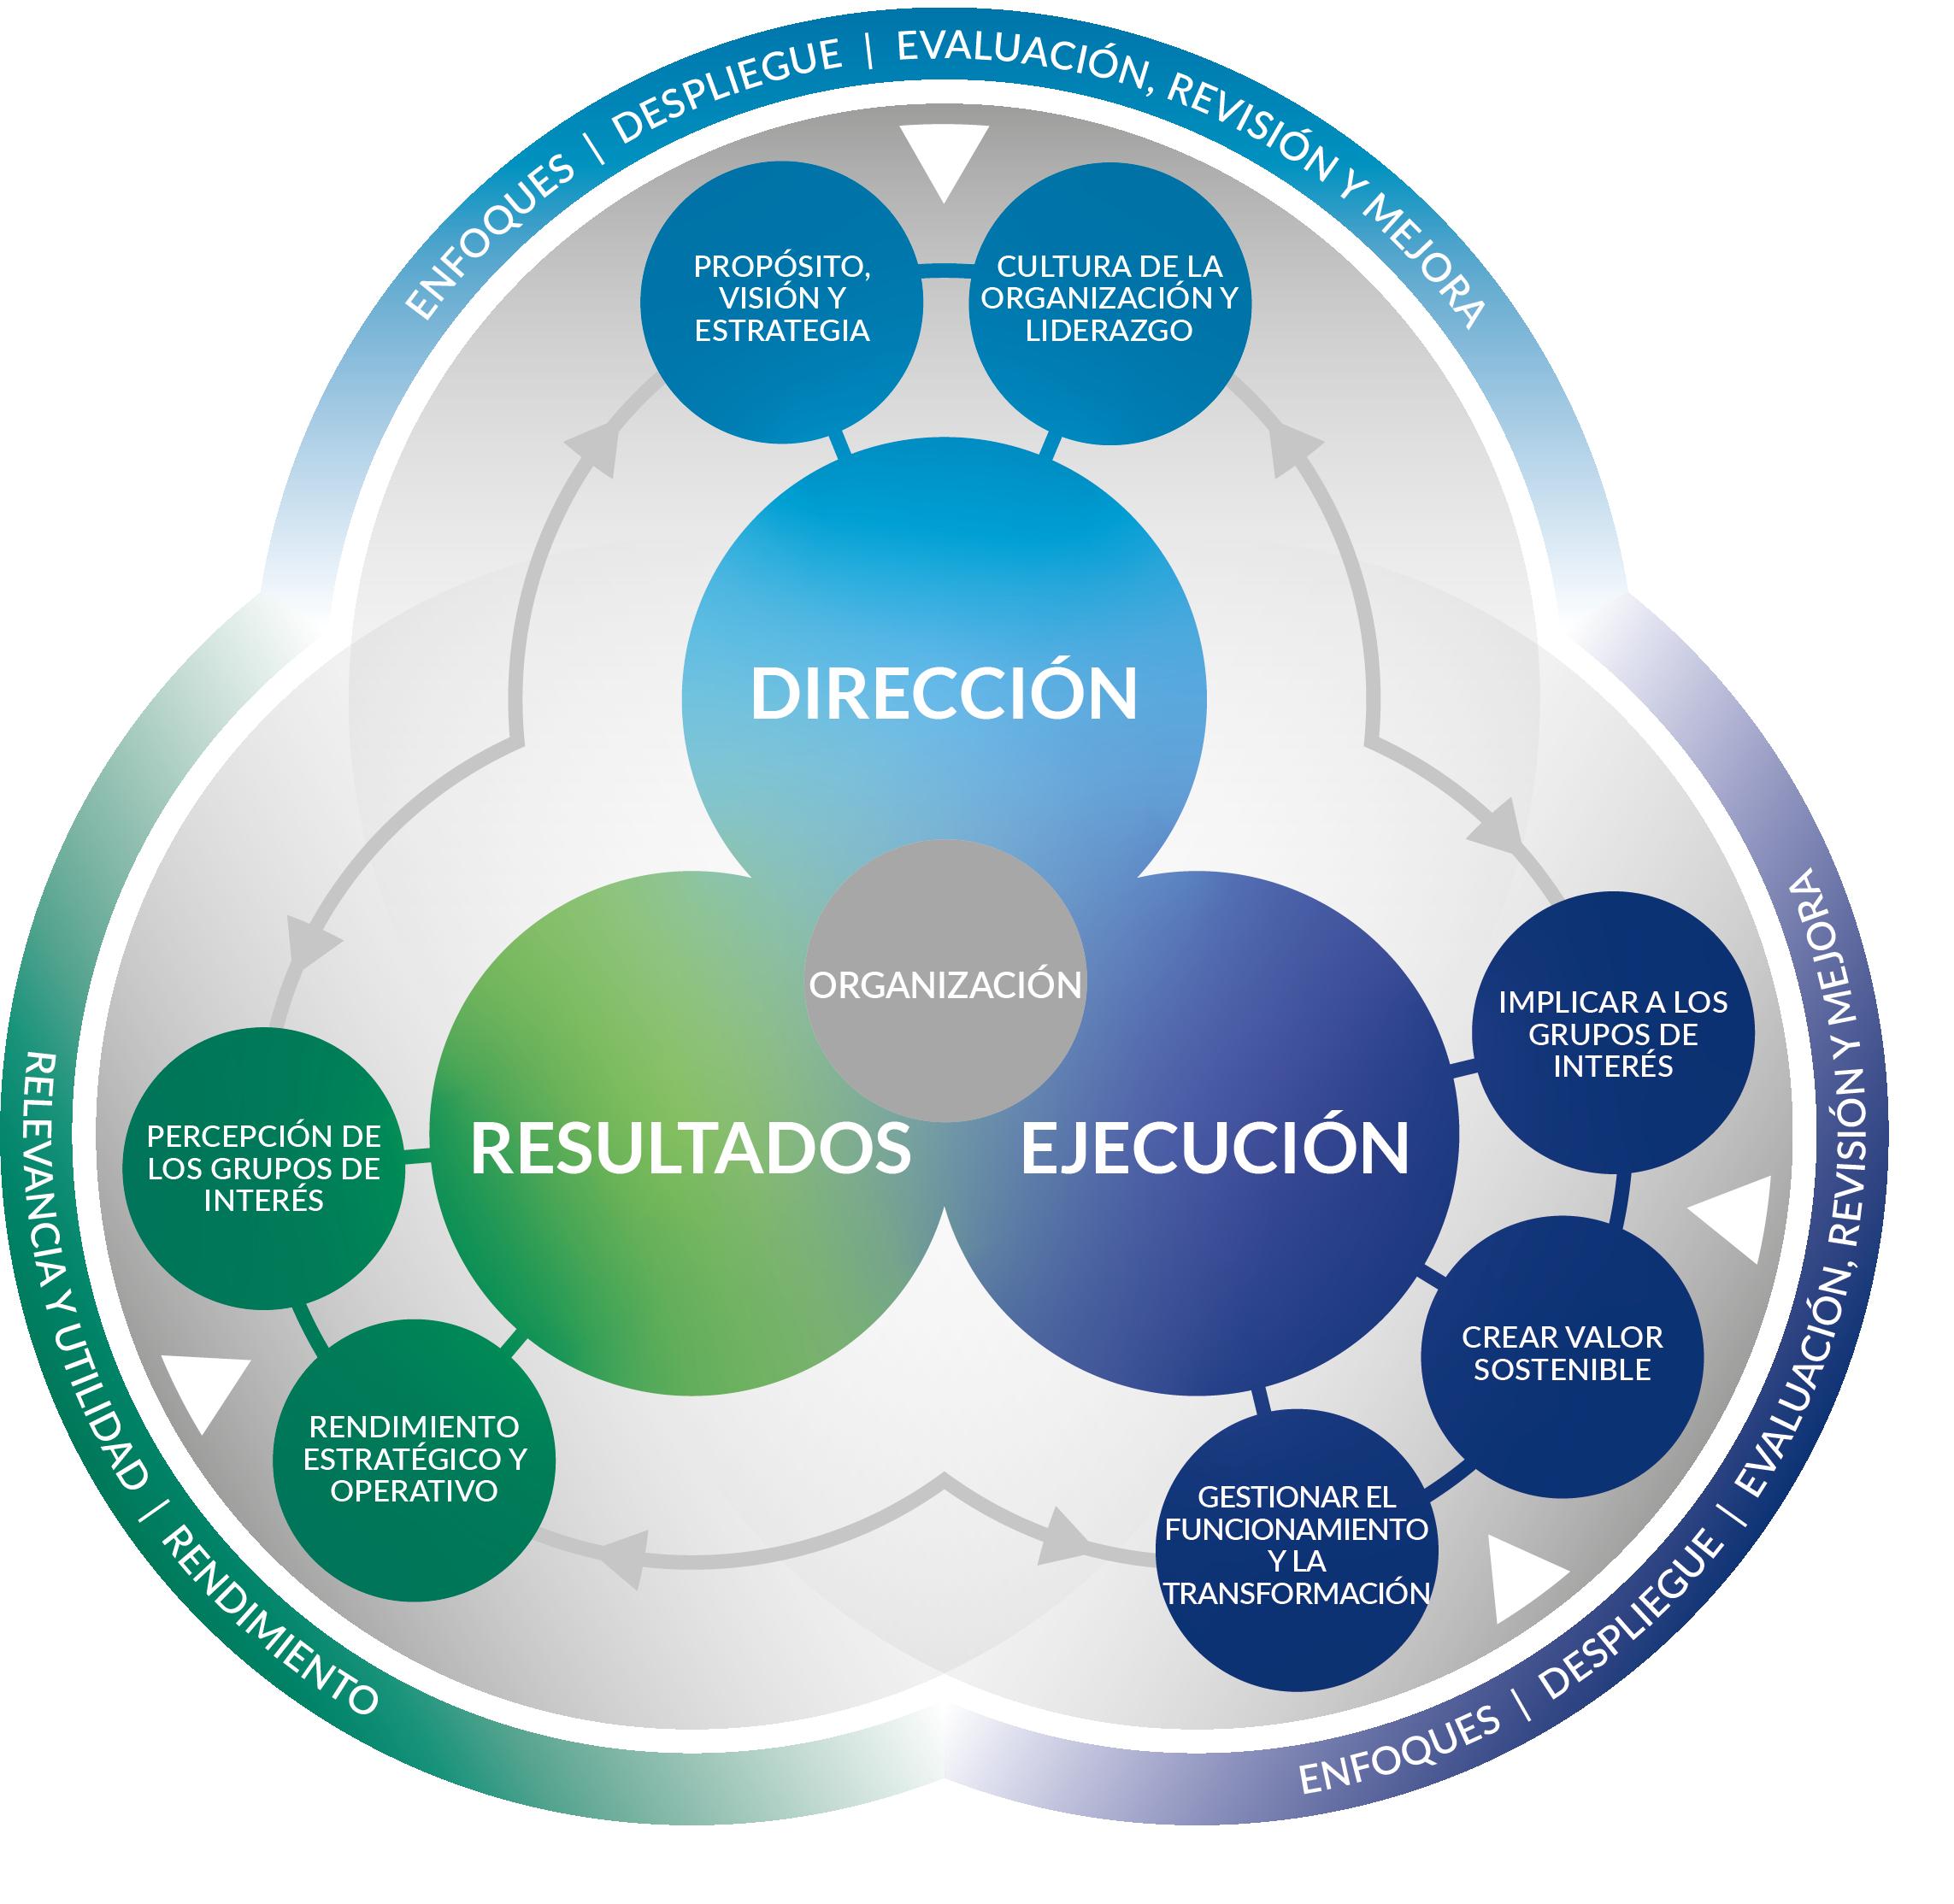 Modelo EFQM 2020: innovación para pymes - RevistaPYMES.es